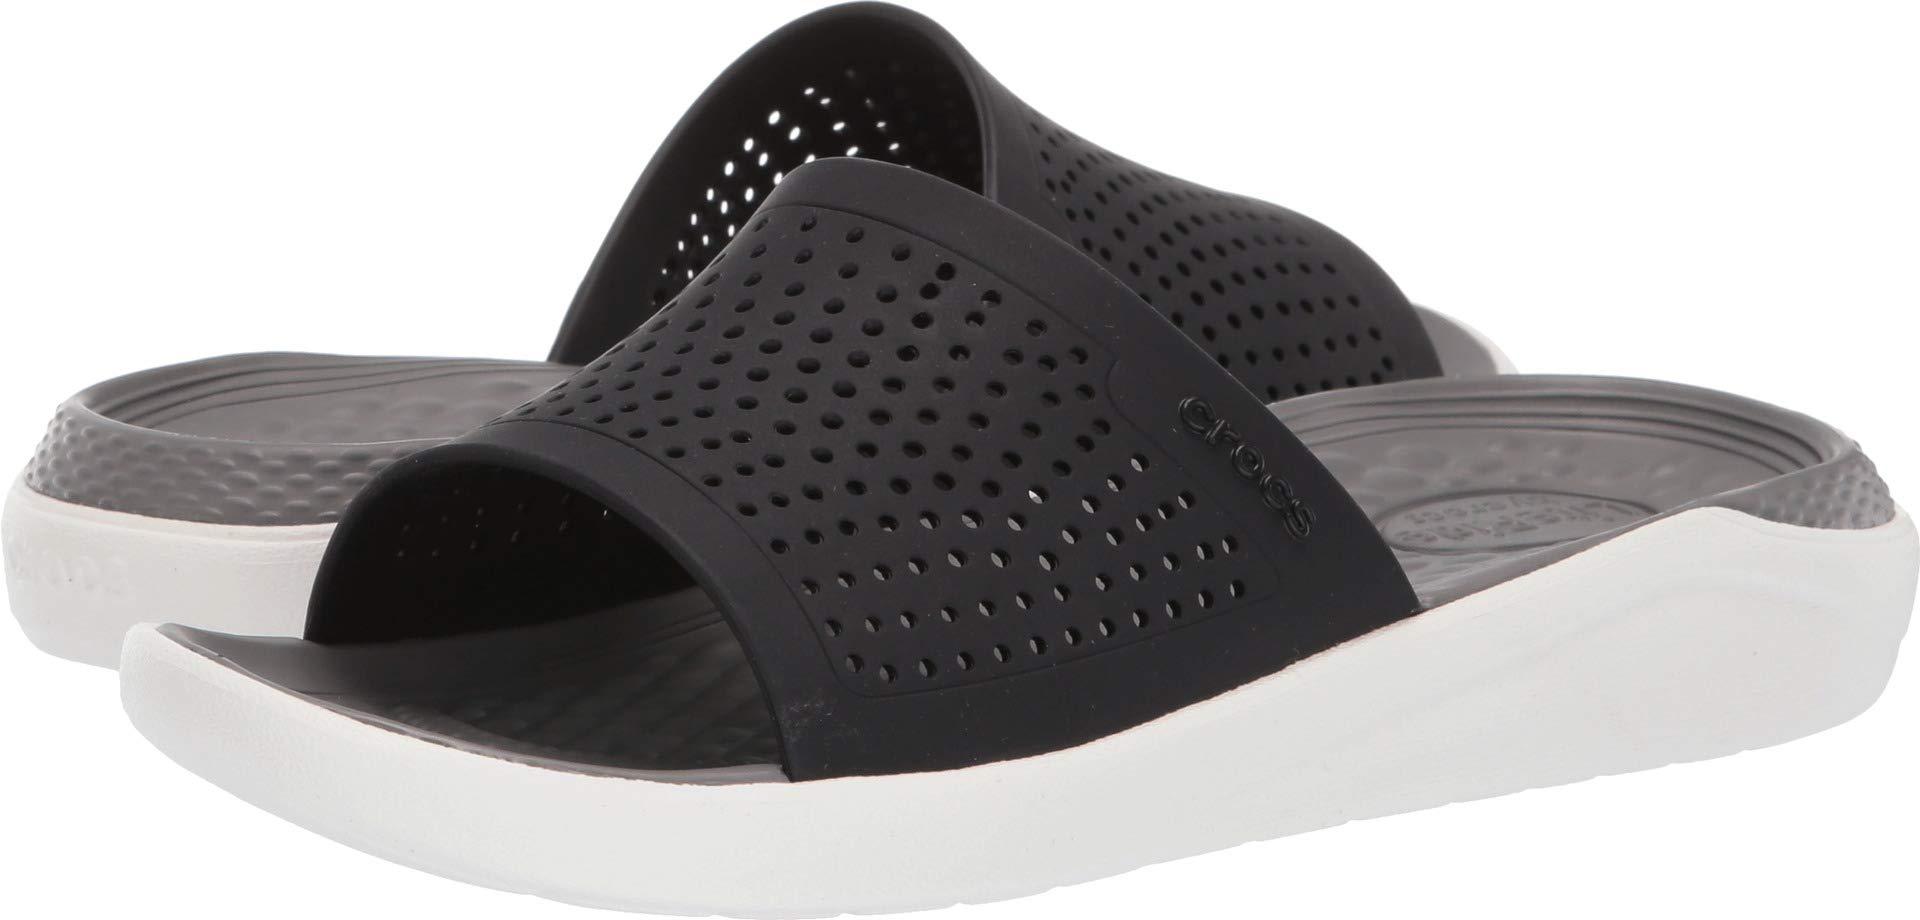 Crocs LiteRide Slide Sandal, Black/Smoke, 12 US Women / 10 US Men by Crocs